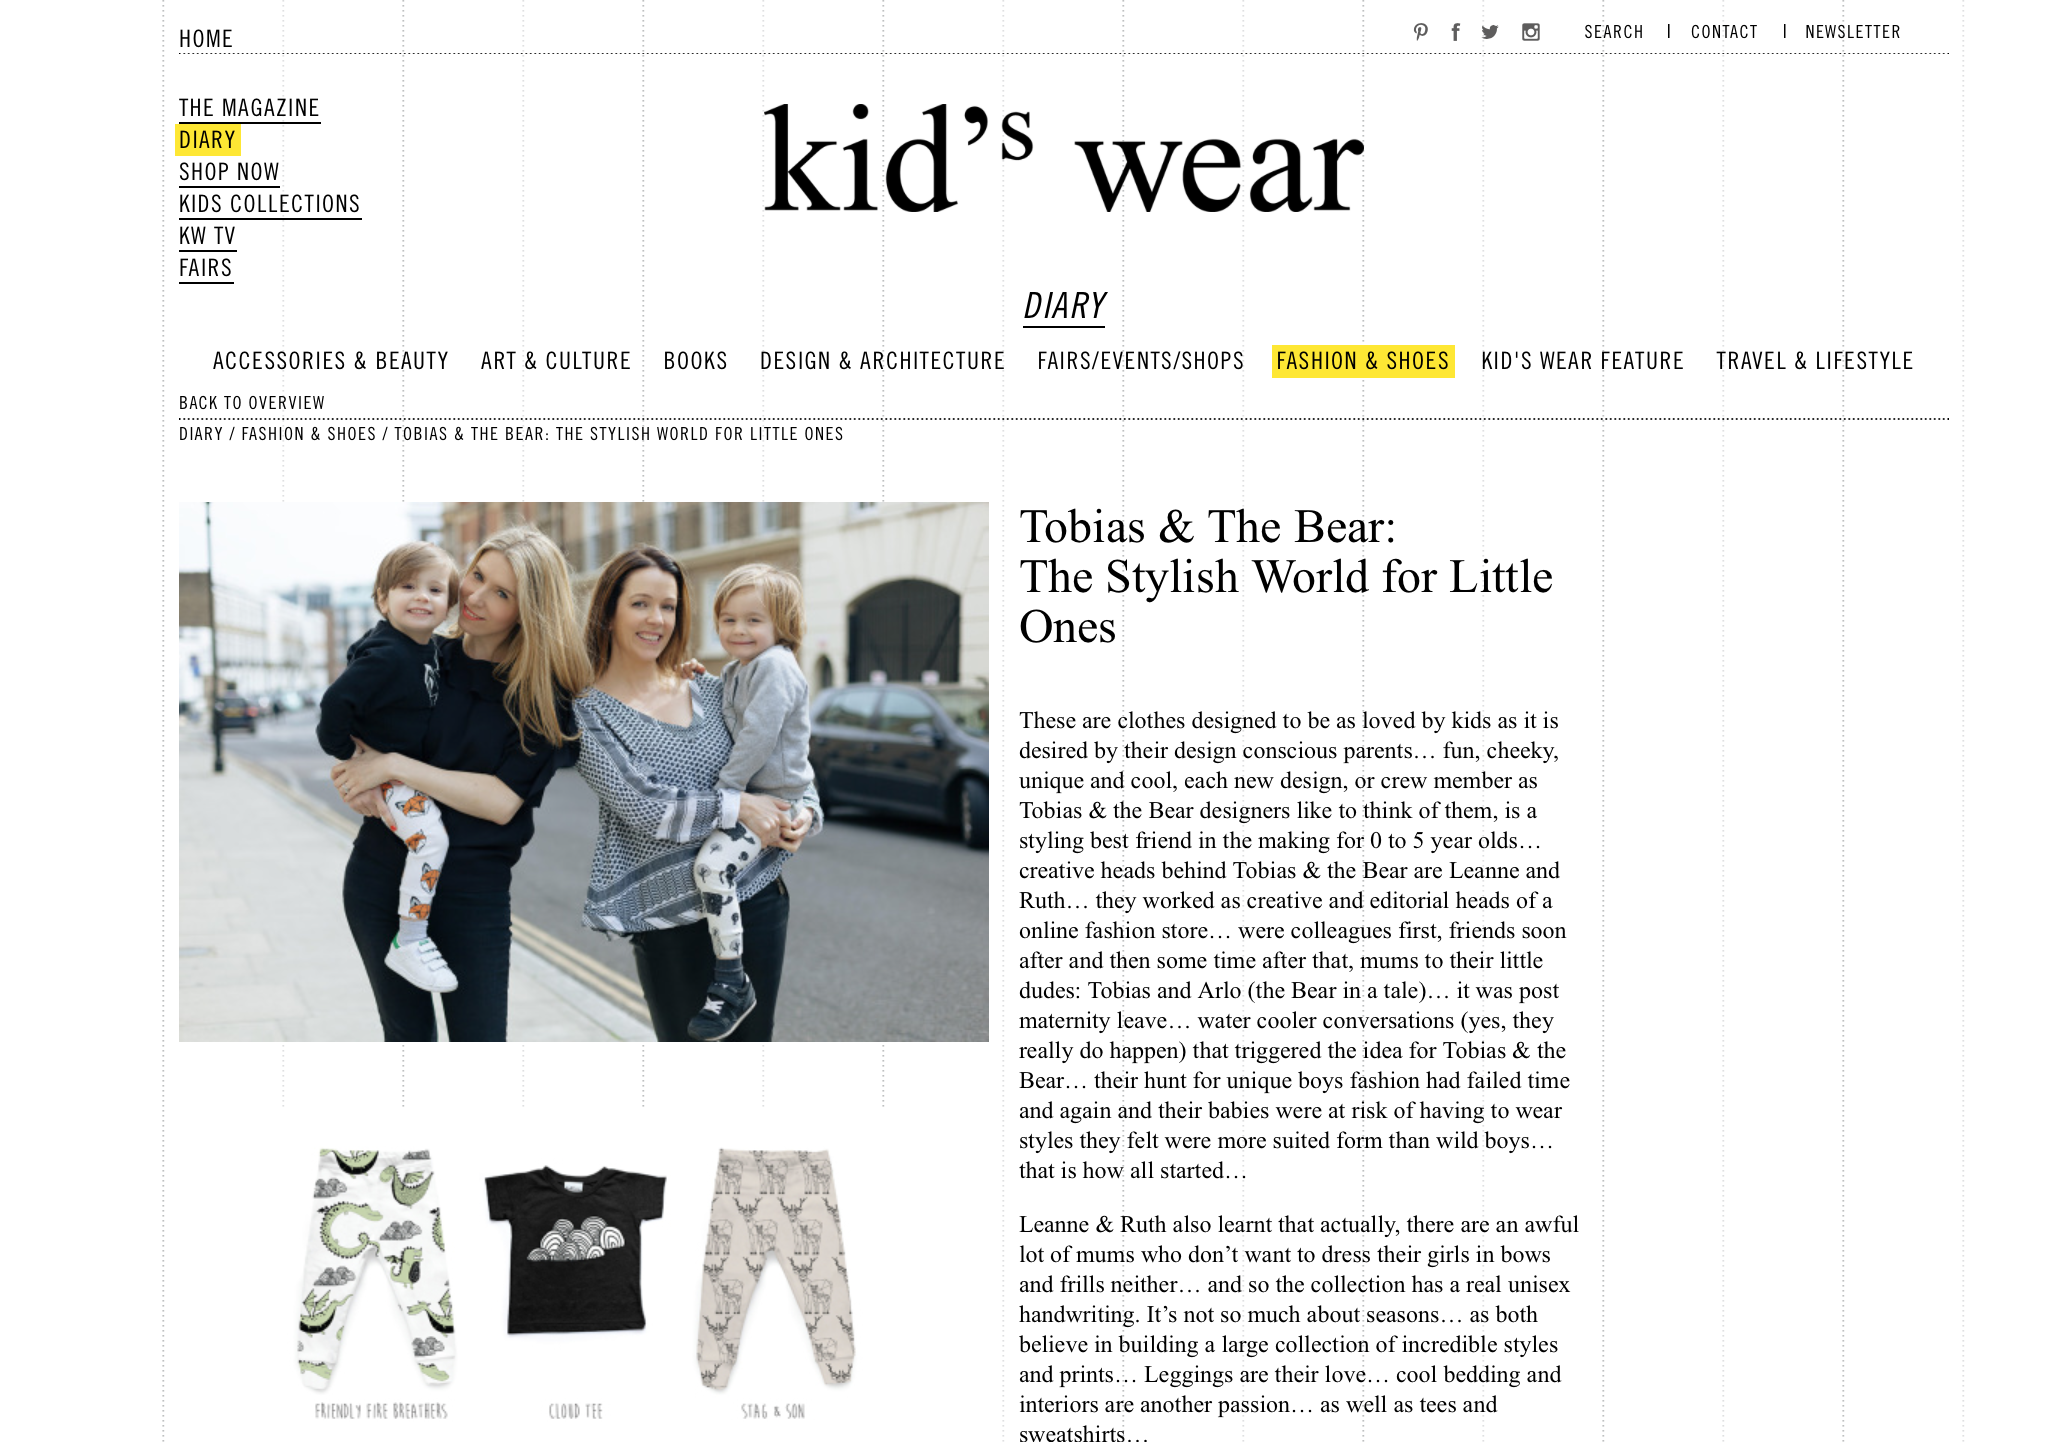 Kid'swear features Tobias & The Bear